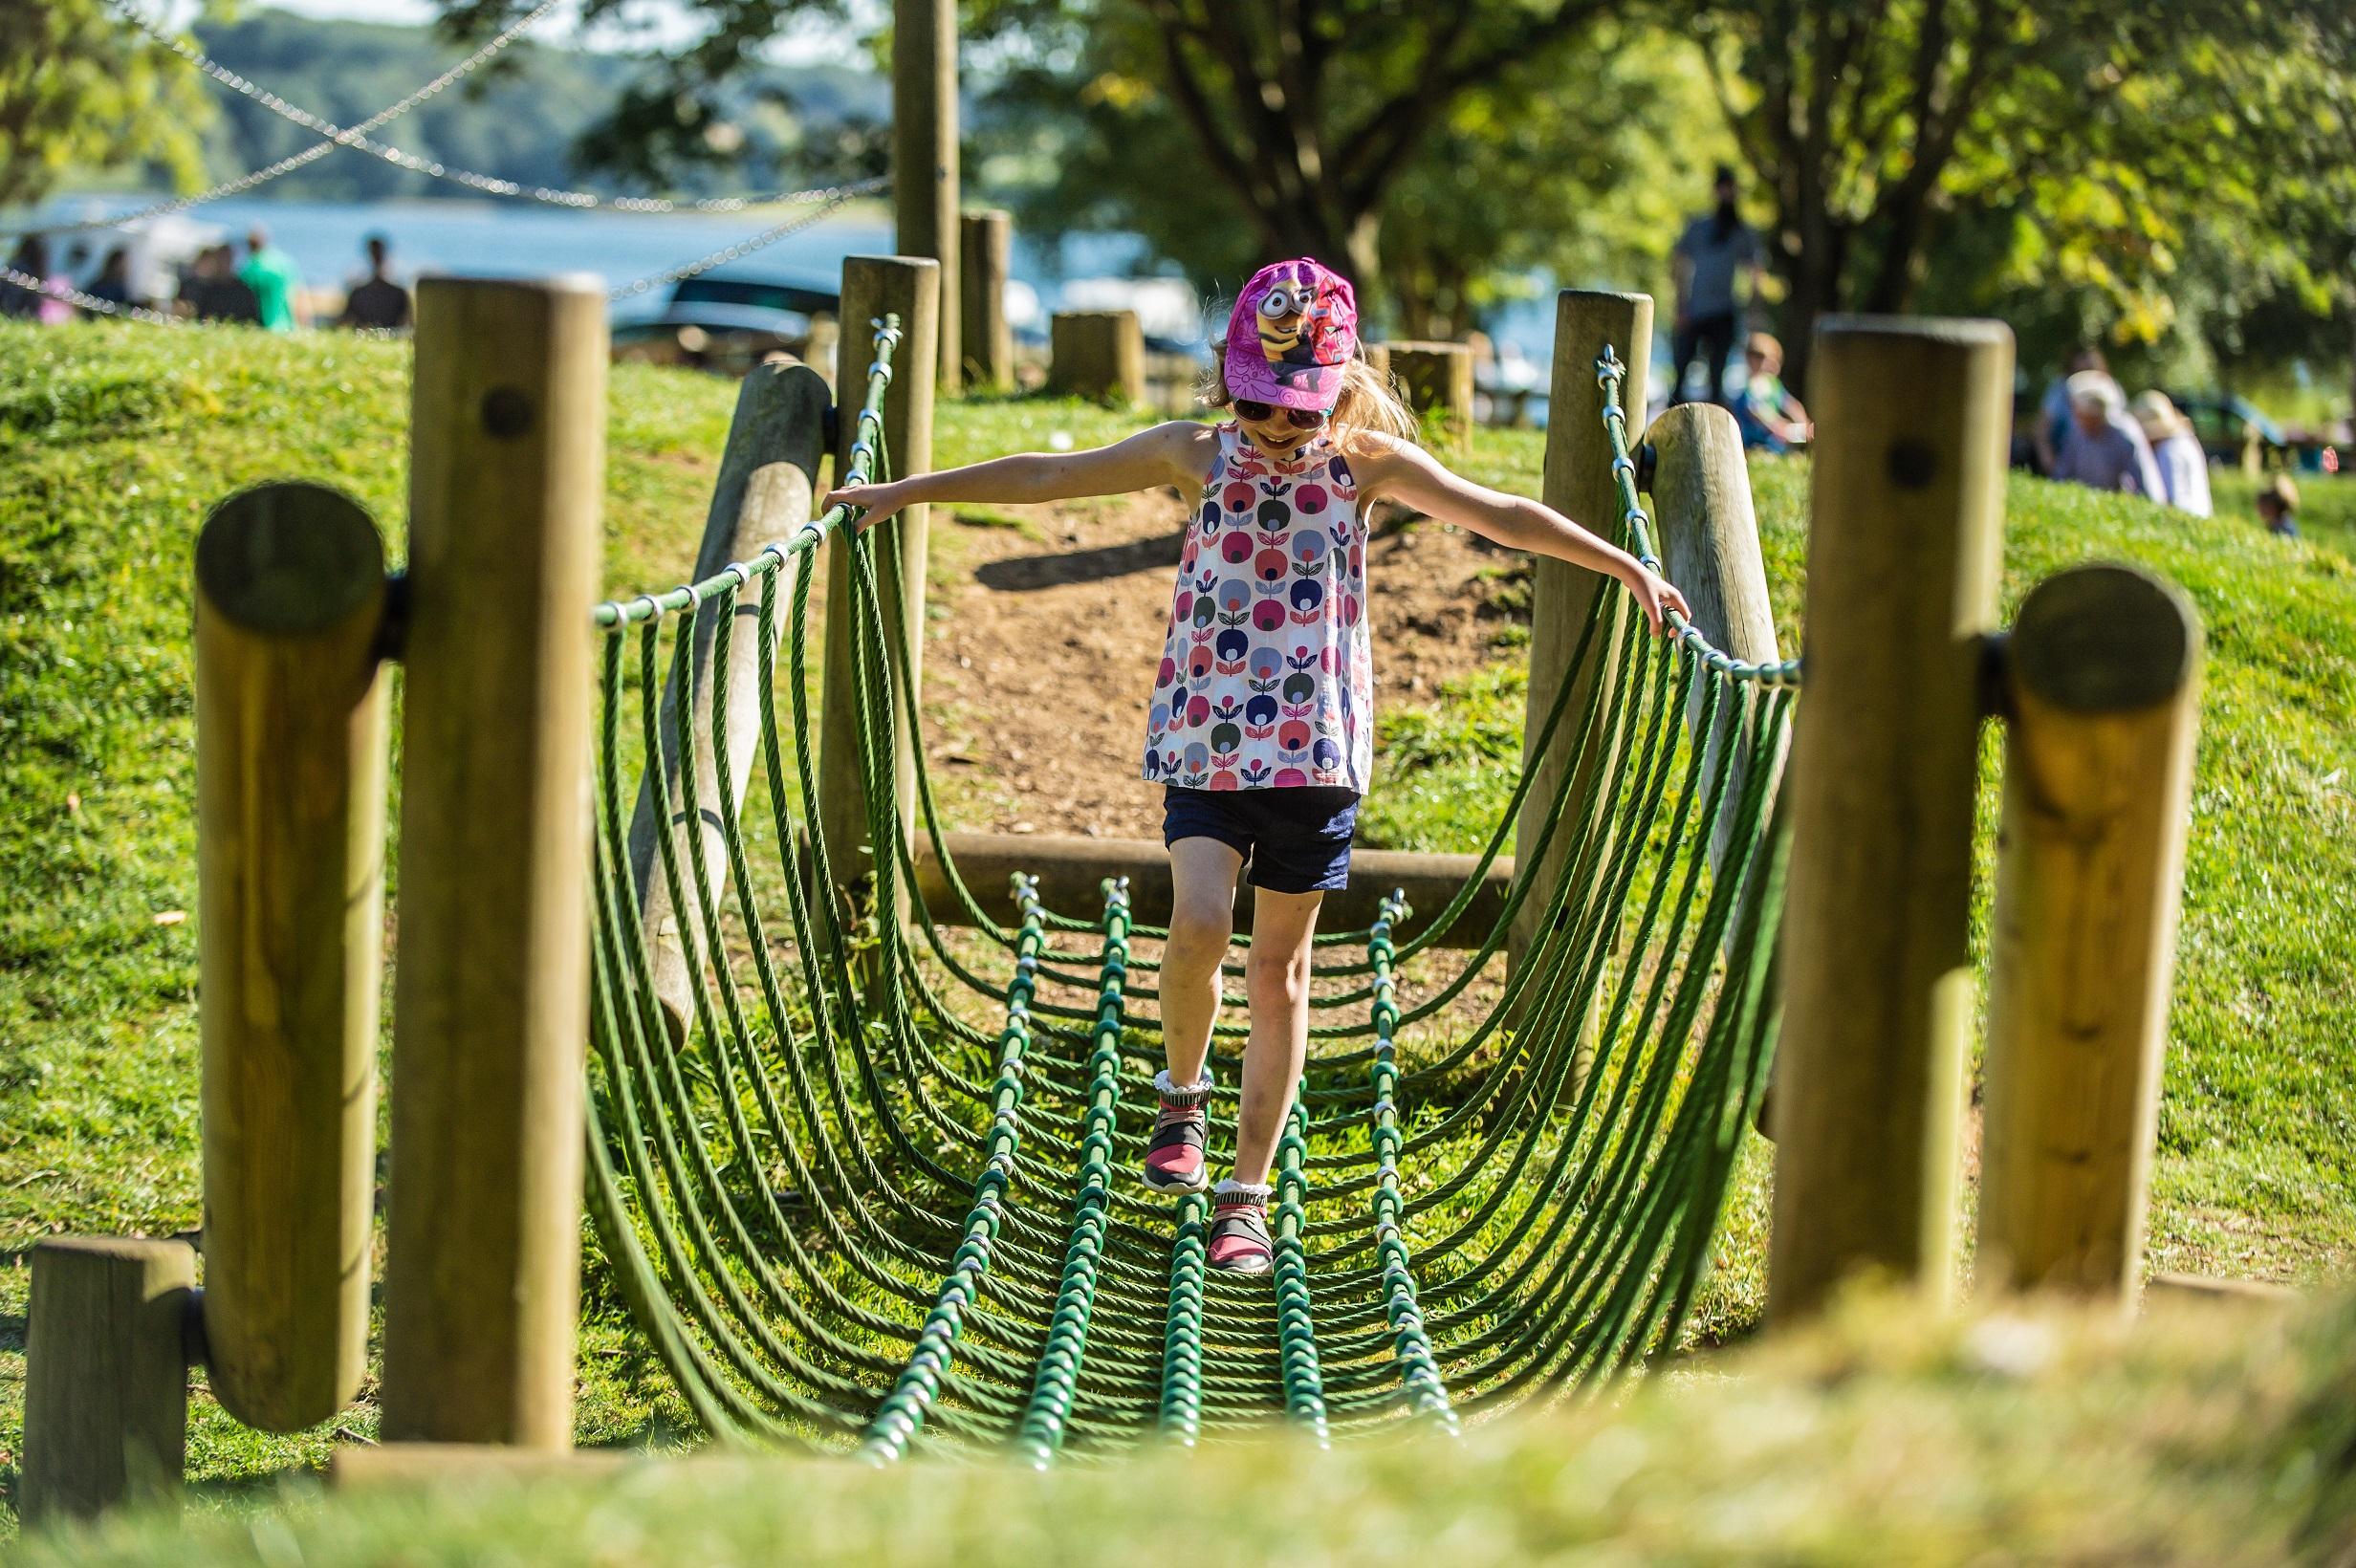 Adventure Playground Sykes Lane